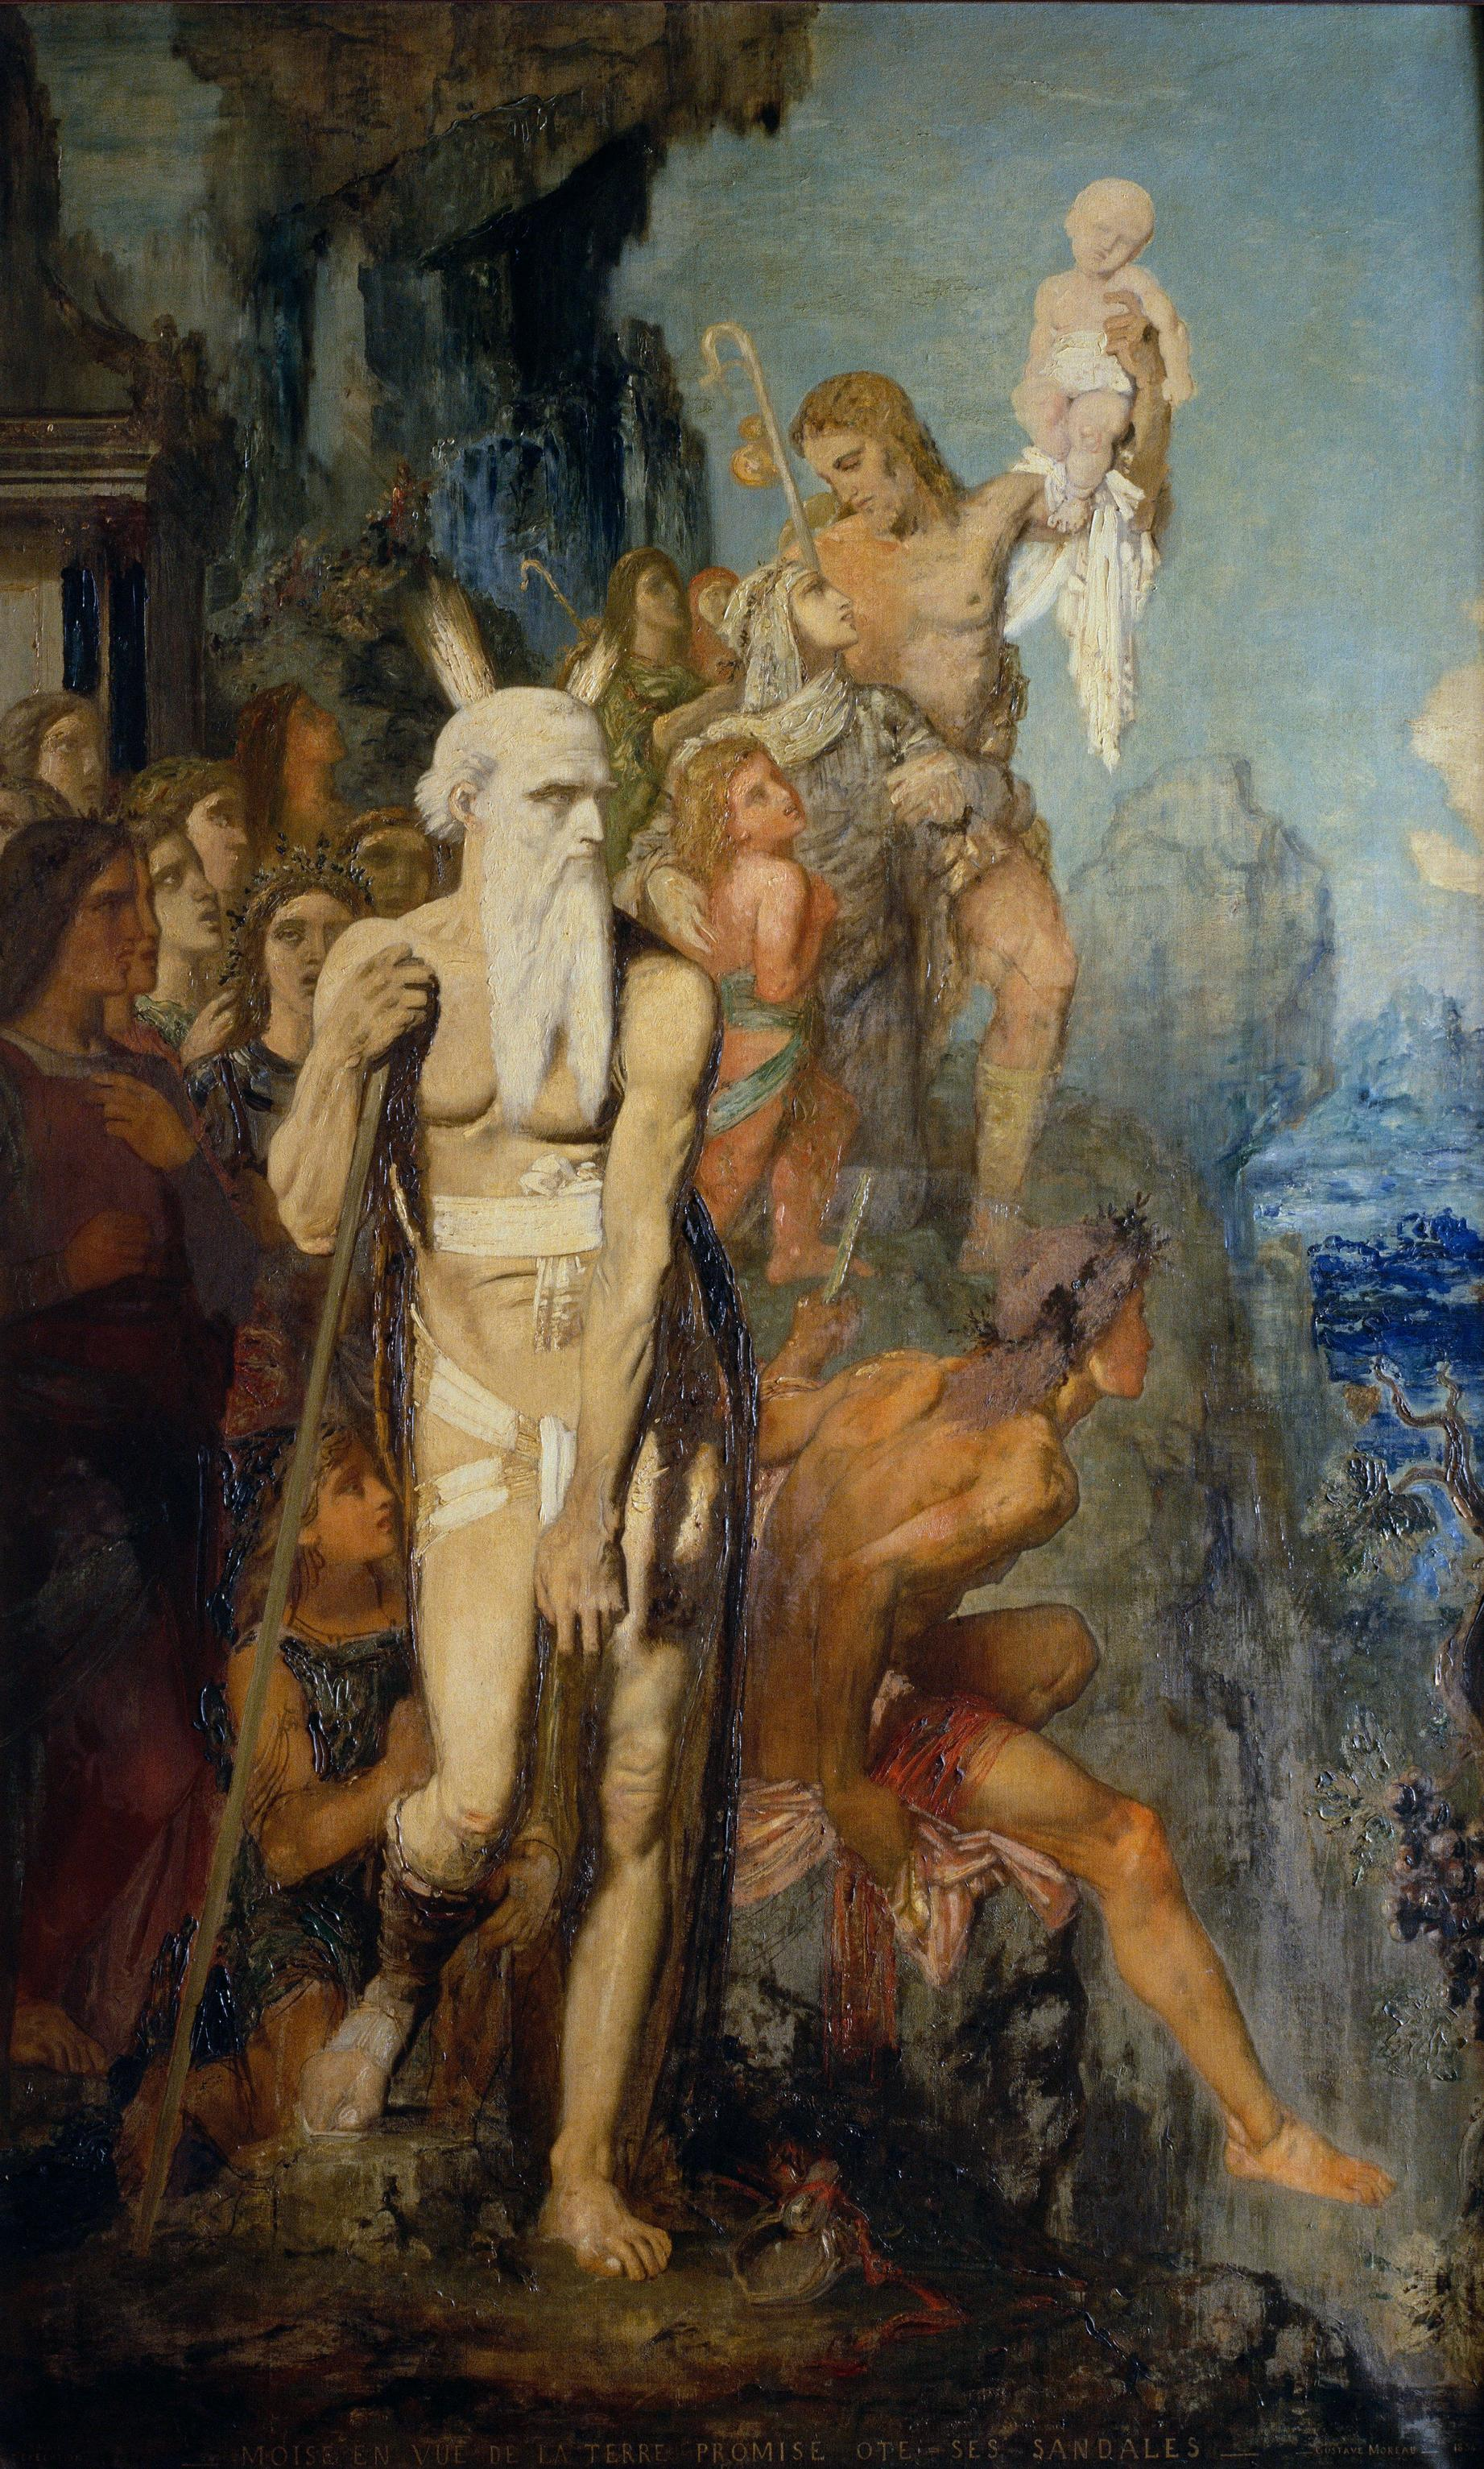 1854_Моисей снимает сандали, глядя на Землю Обетованную (245 х 151 см) (Париж, музей Гюстава Моро).